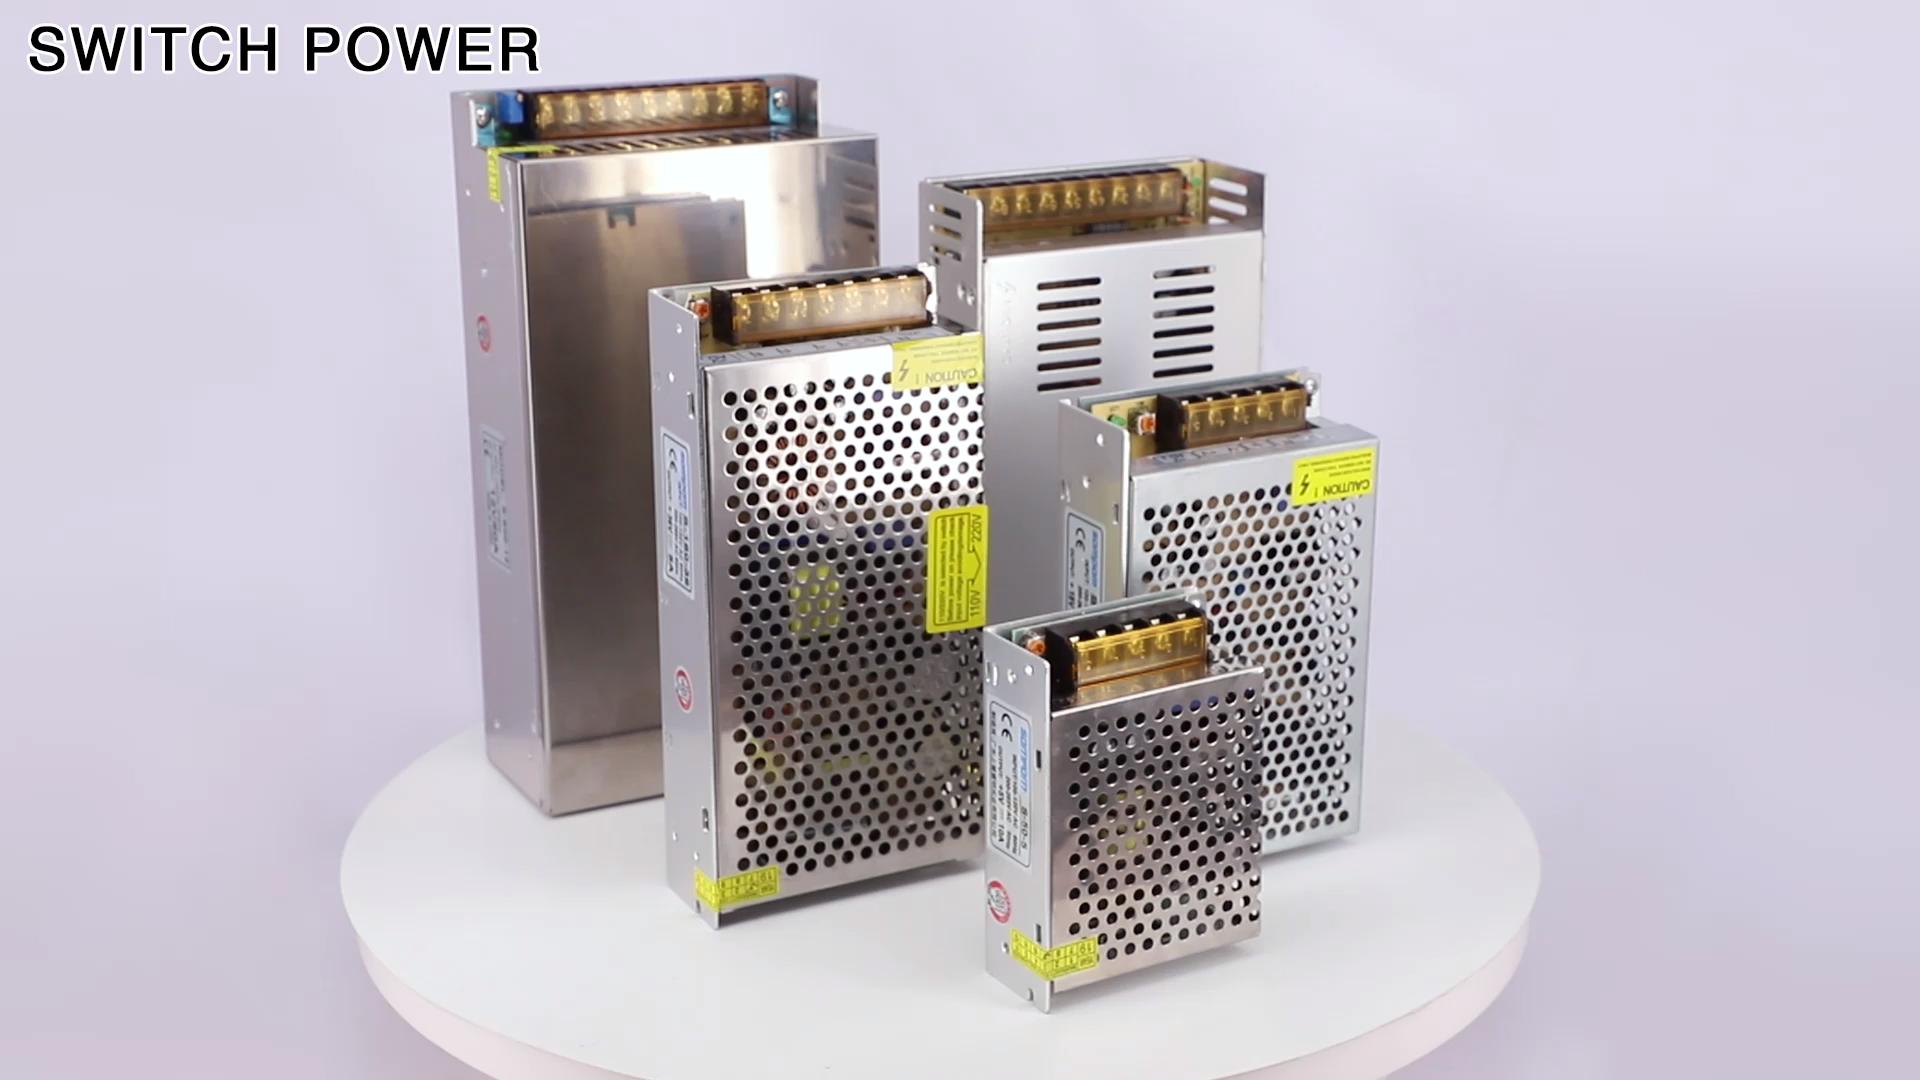 28V 10A power supply 28V3V6V9V13.8V52V 1a 2a 3a 2.5a 5a